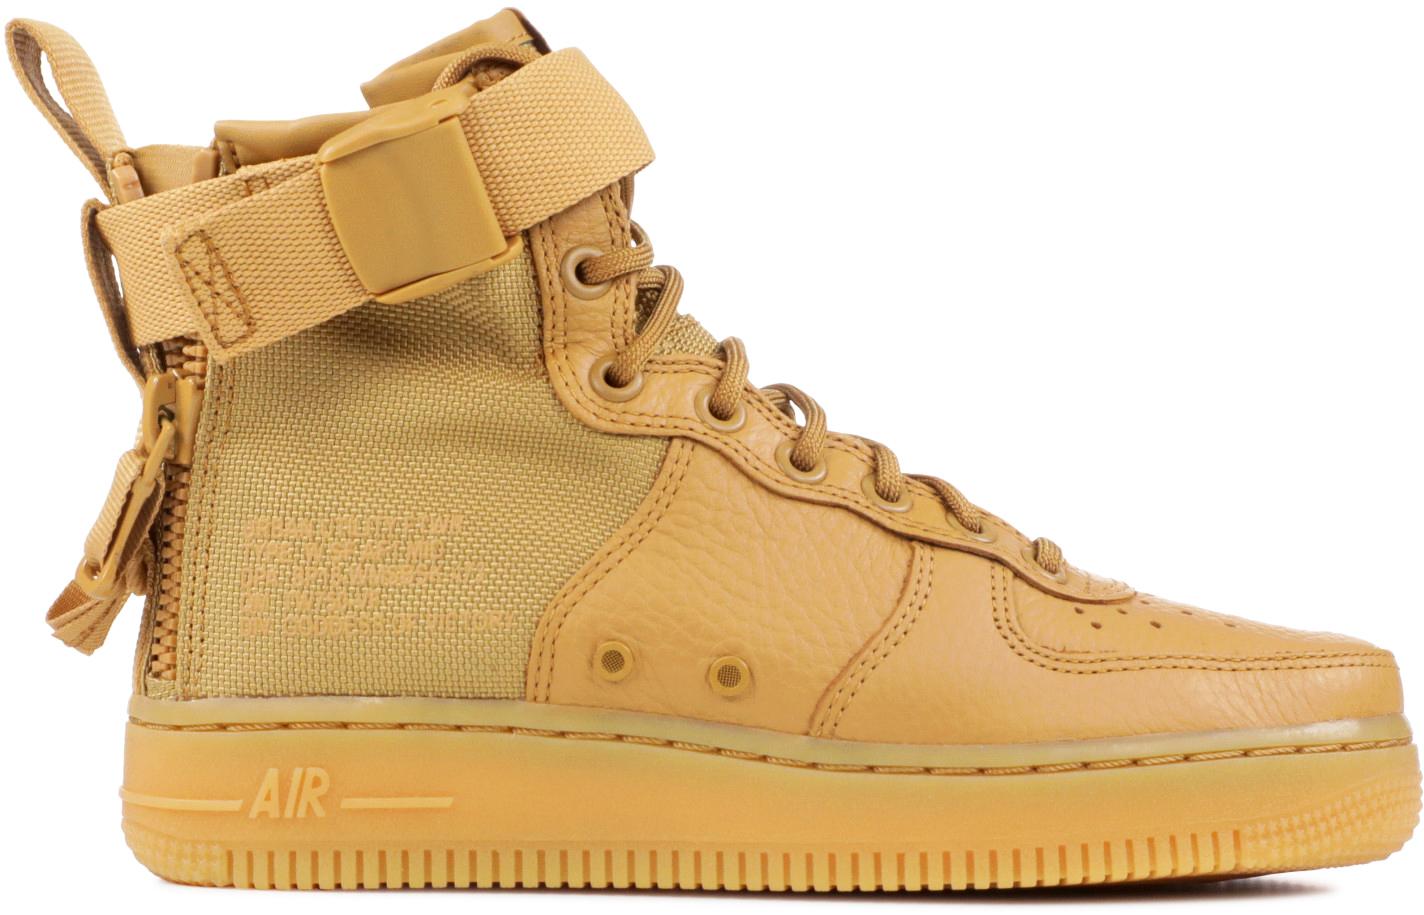 Nike SF Air Force 1 Mid Elemental Gold